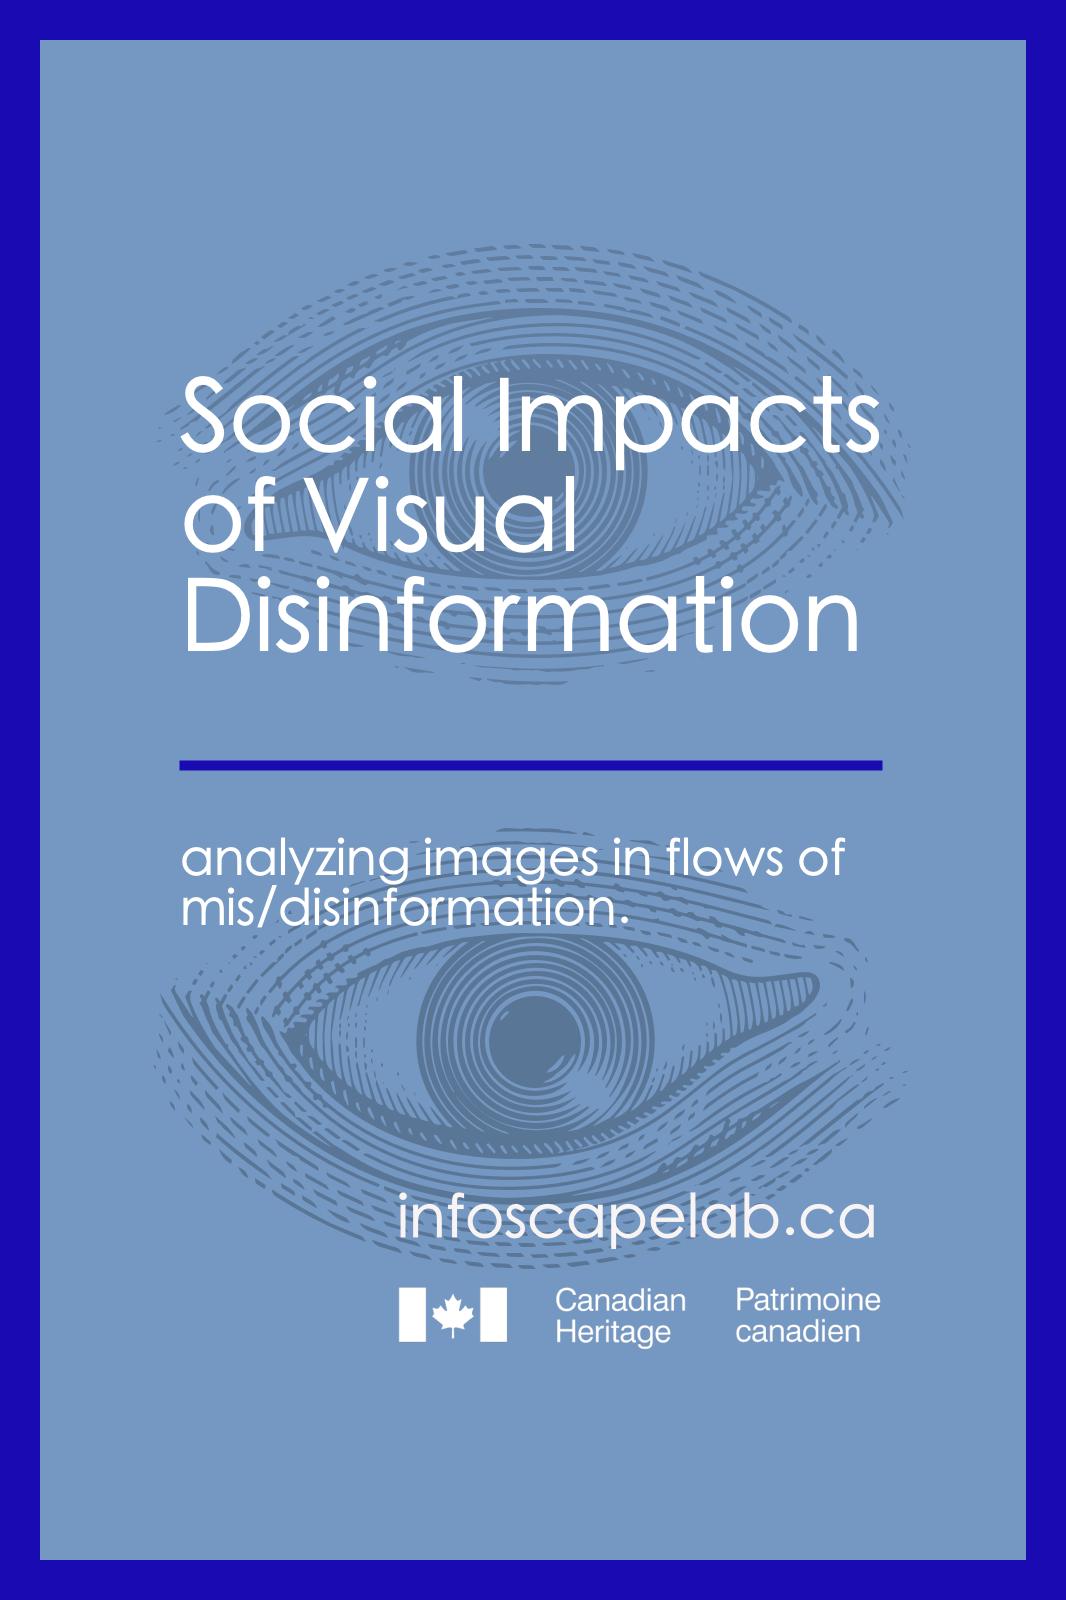 visual disinformation